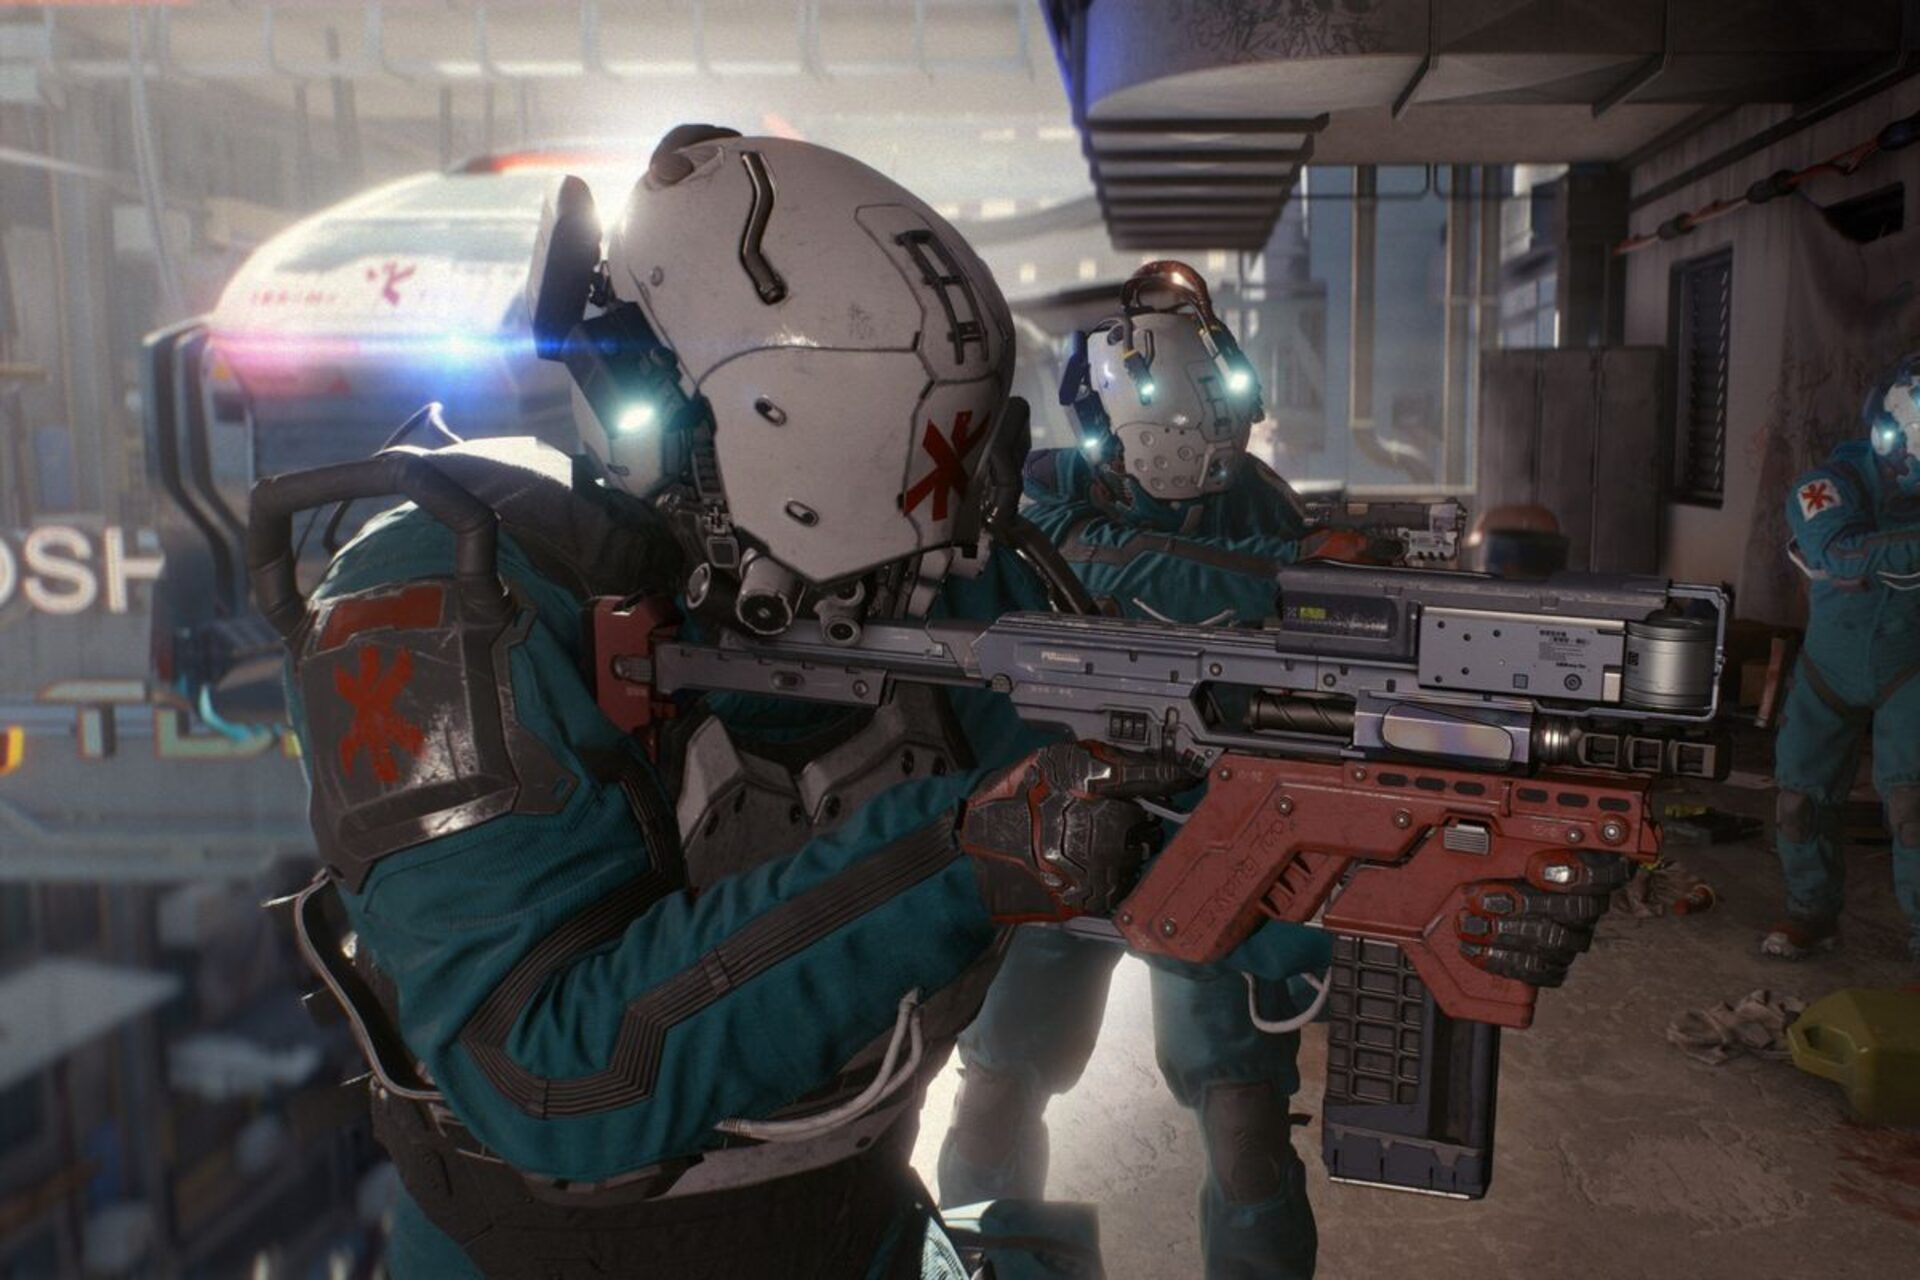 Buy Cyberpunk 2077 key